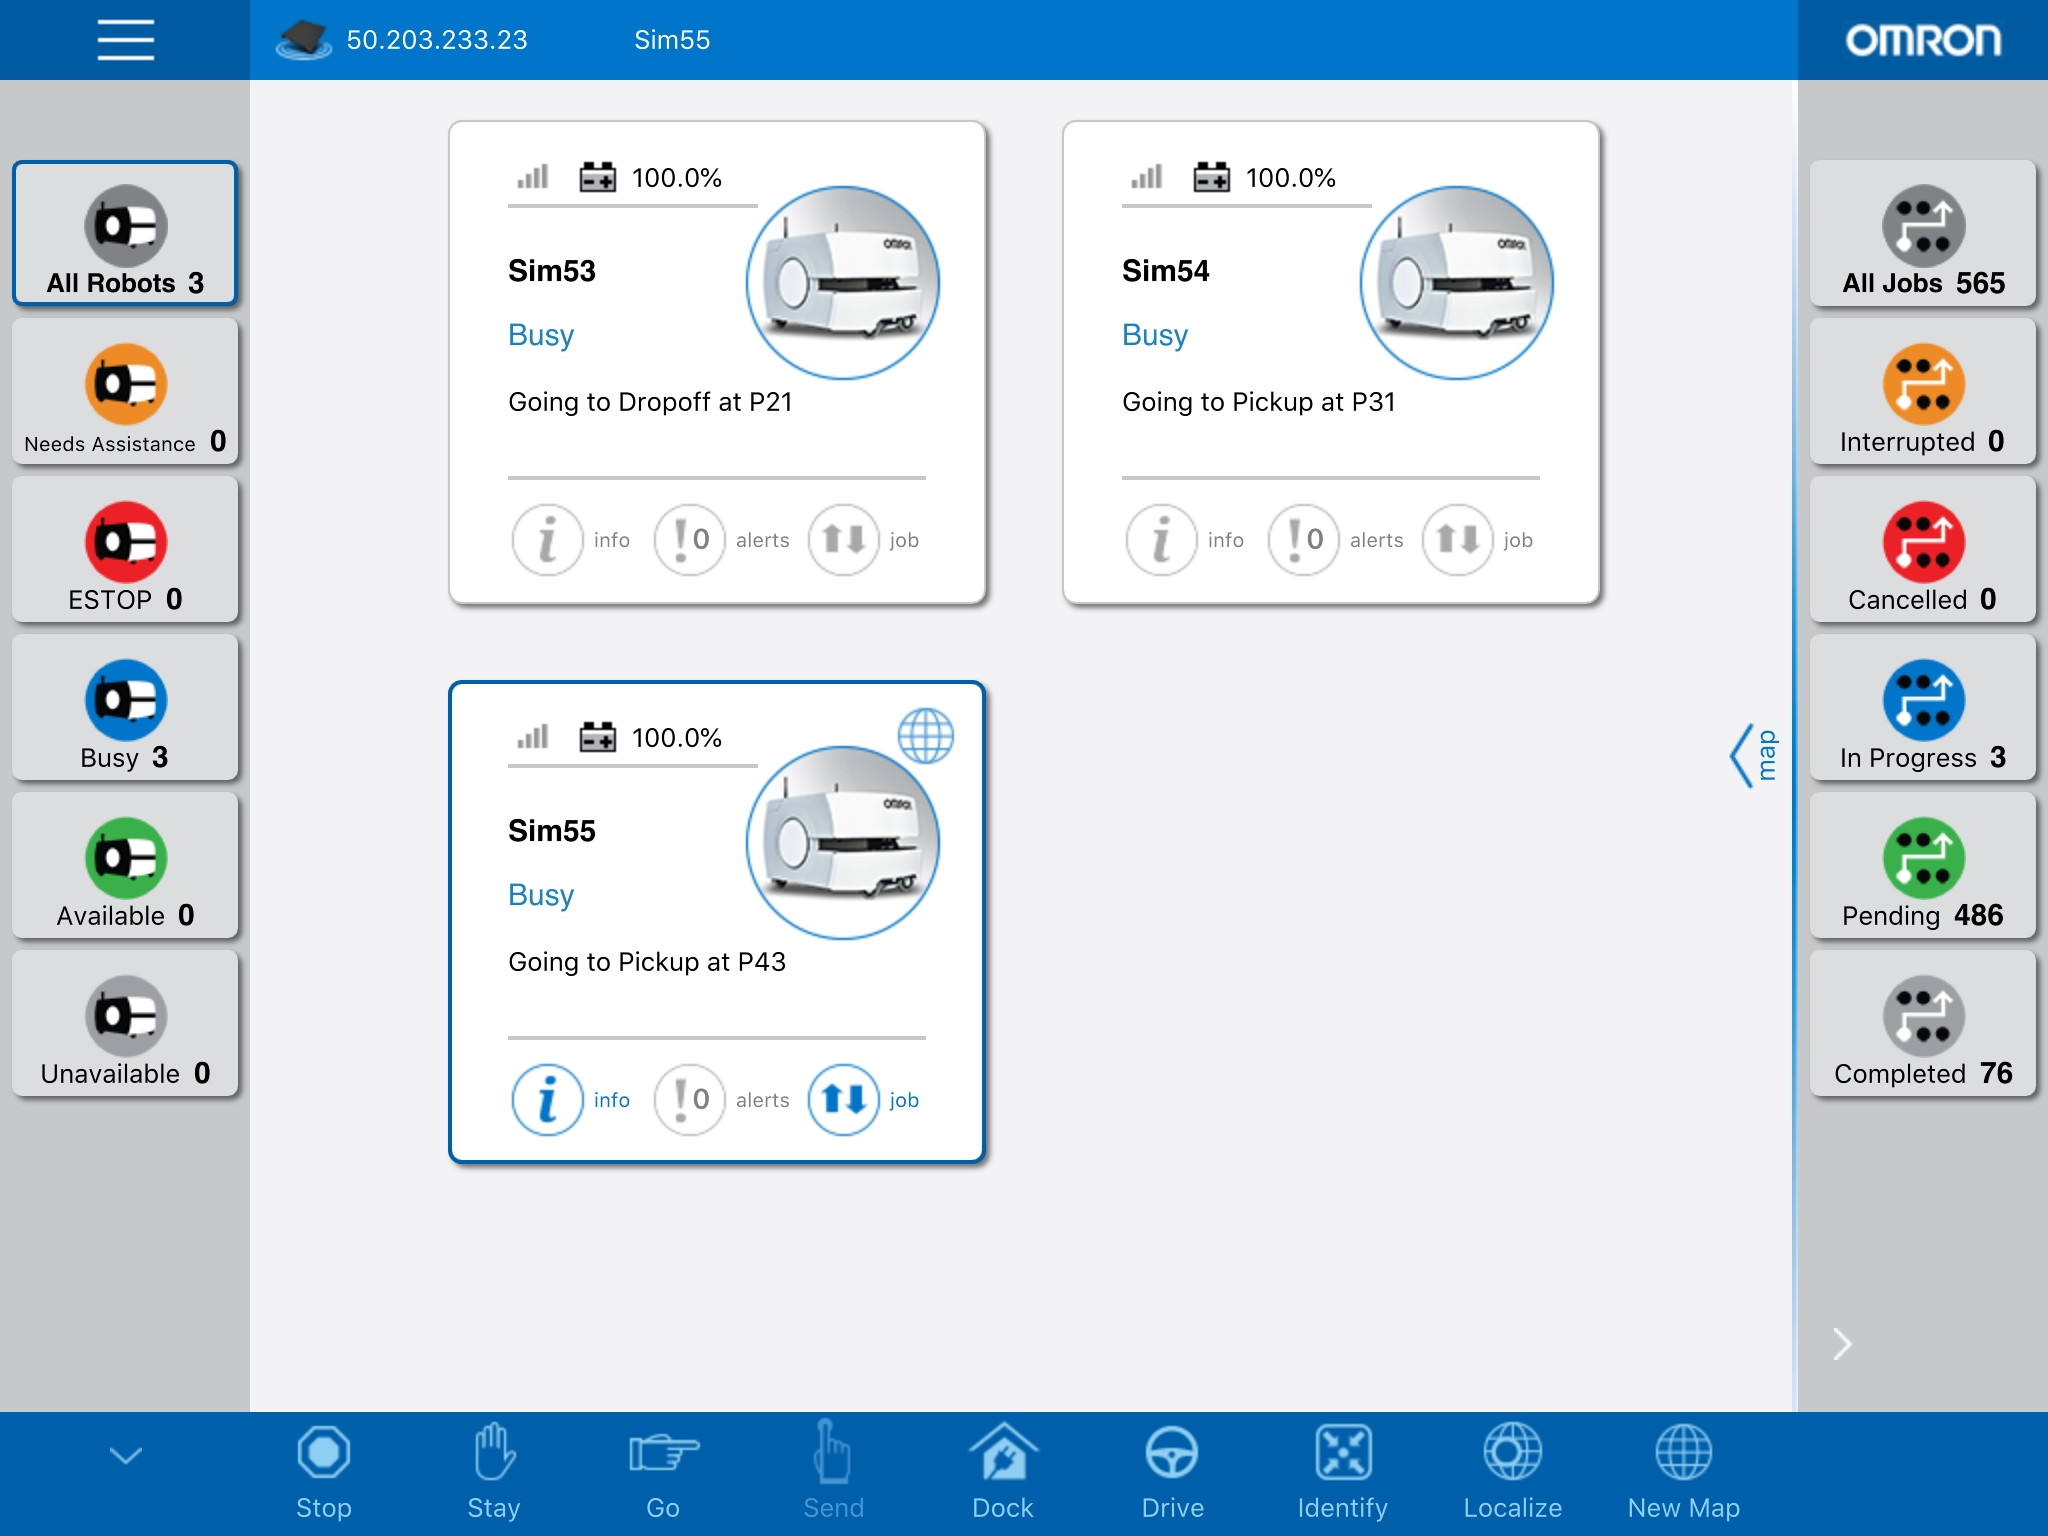 Mobile_Planner_Tablet_Image.jpg